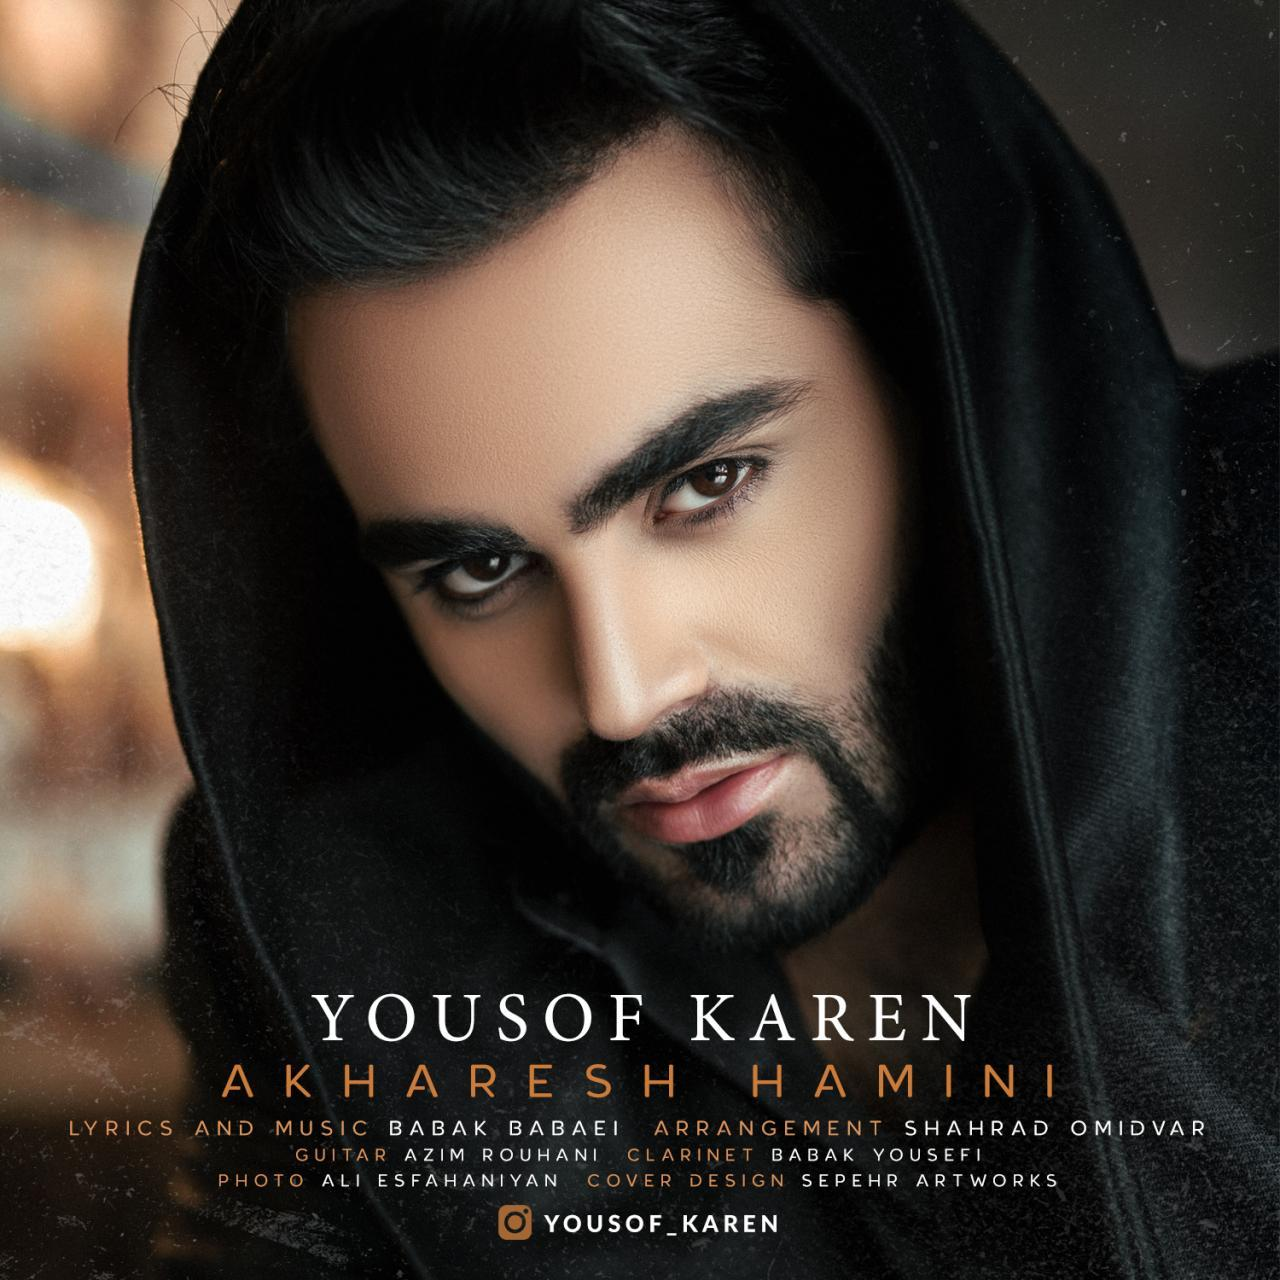 Yousof Karen – Akharesh Hamini